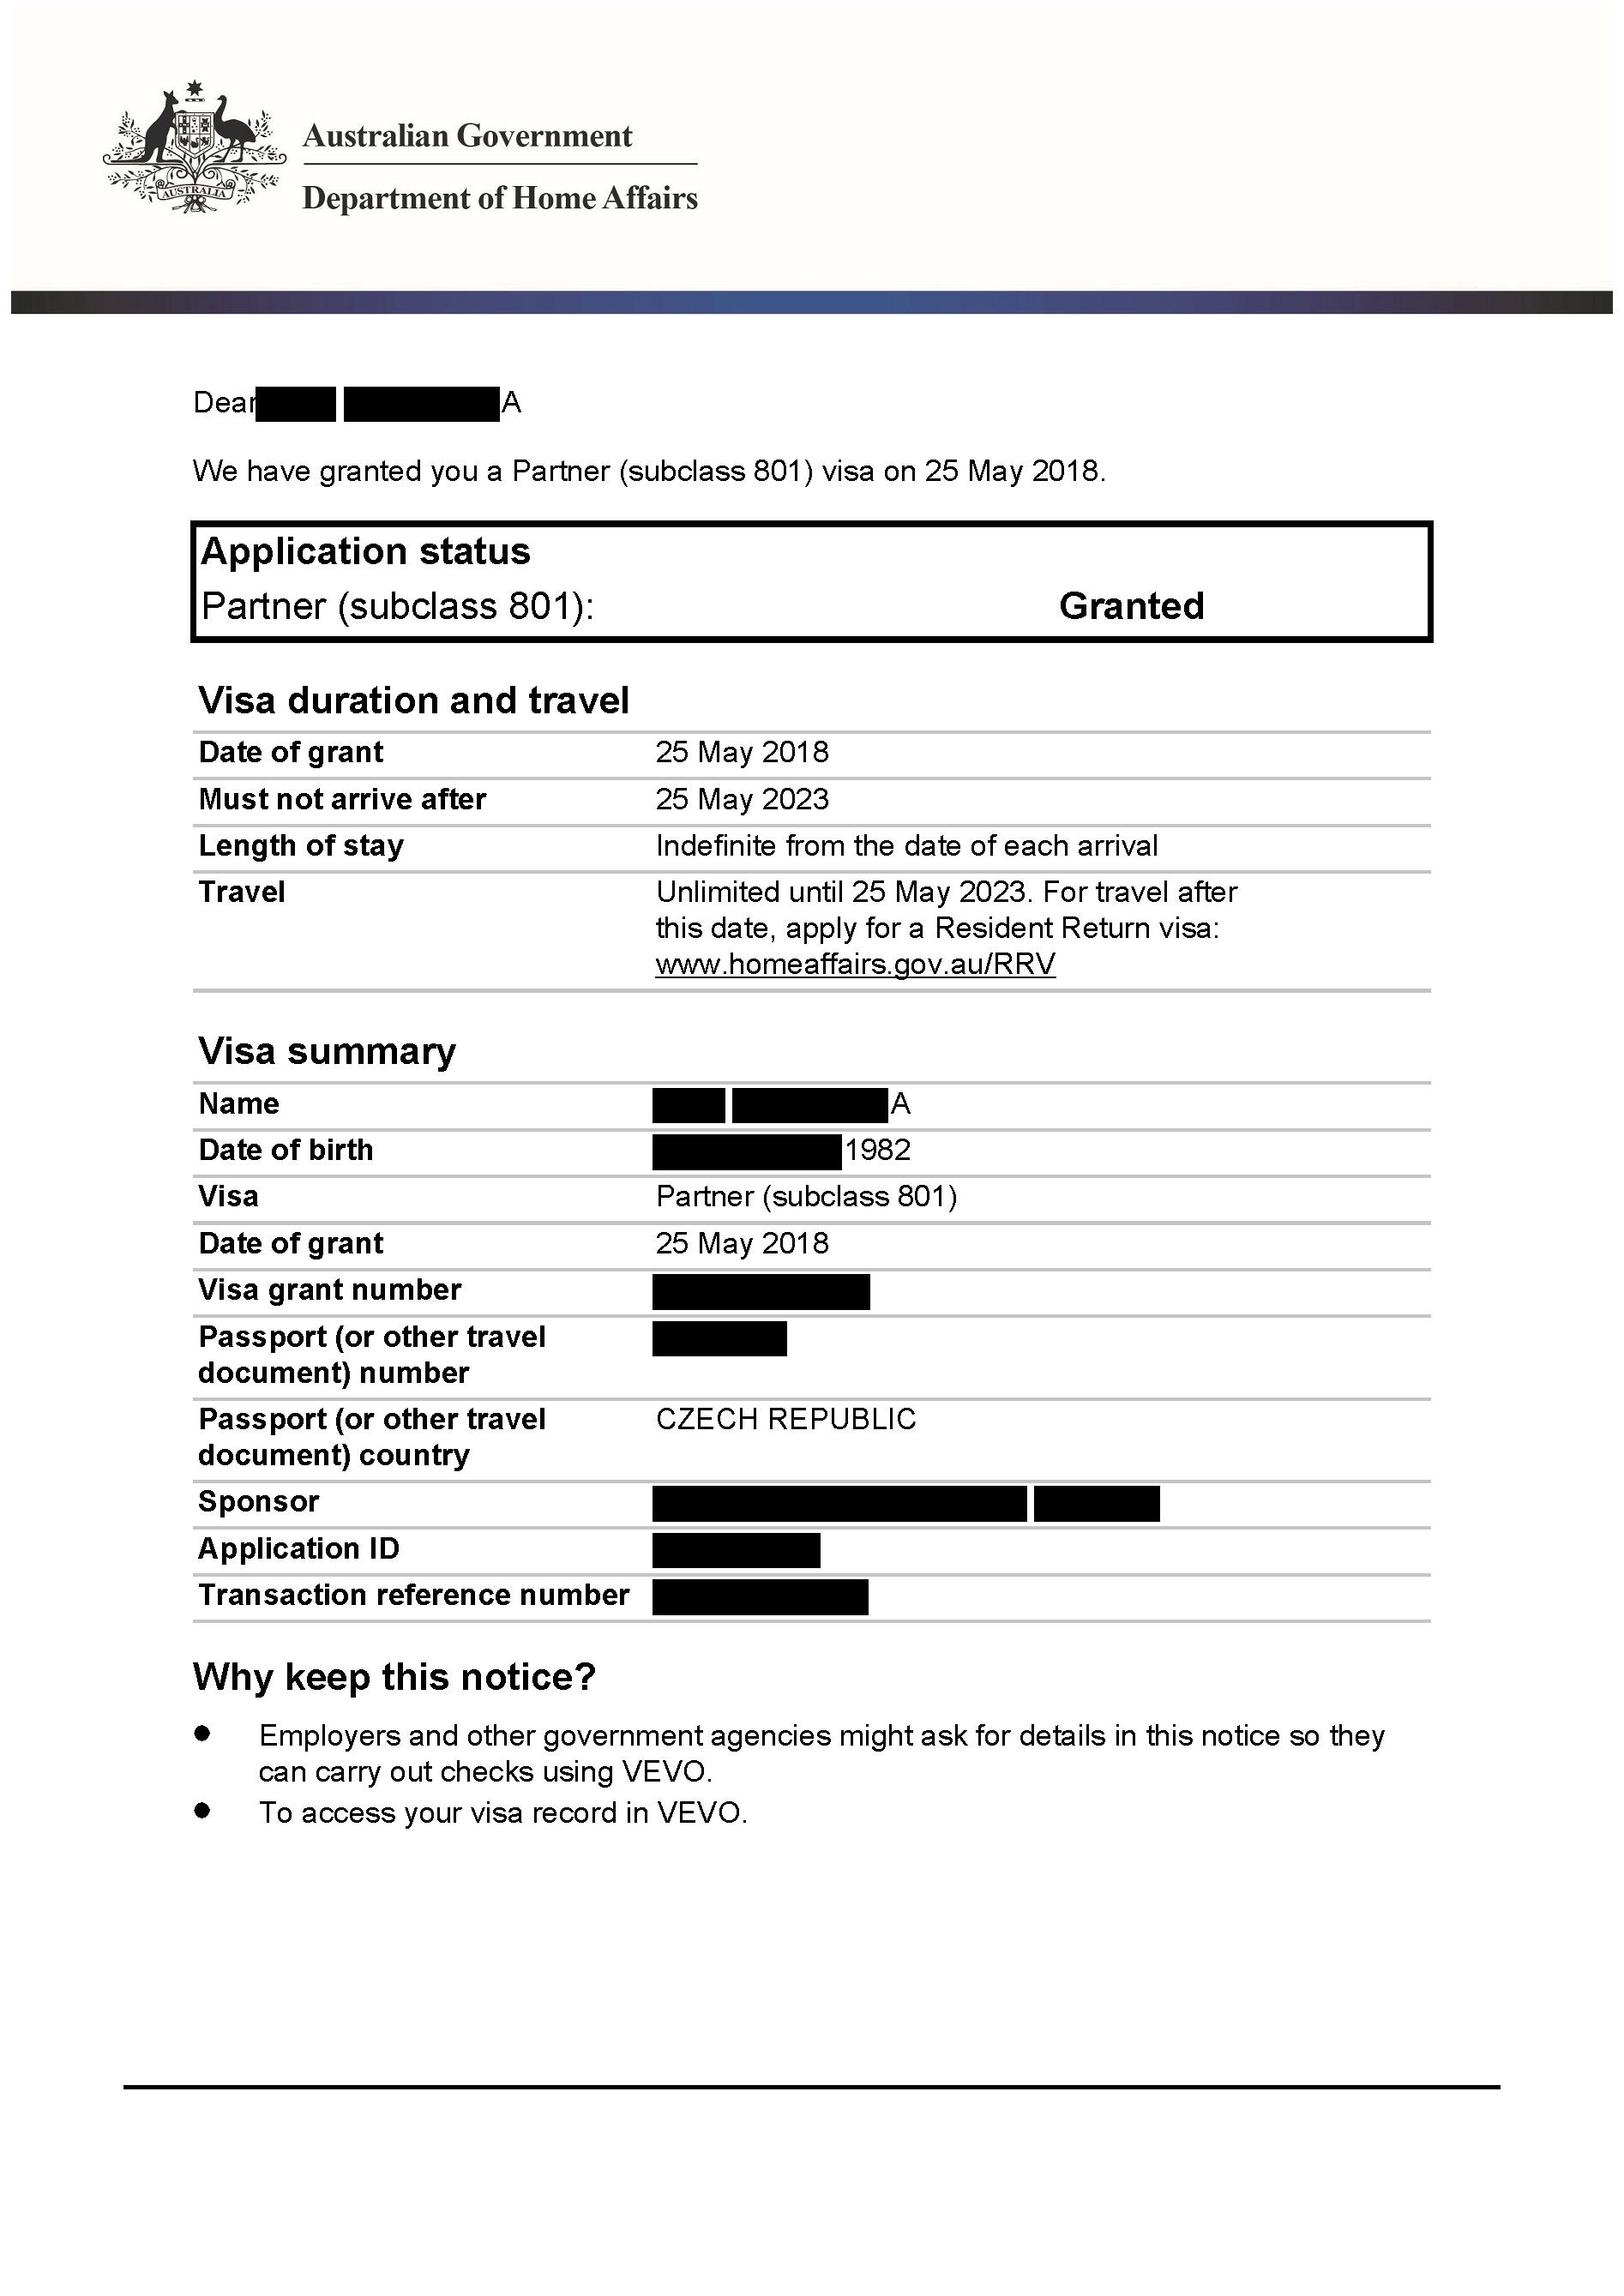 IMMI Grant Notification 801 Mel_Redacted